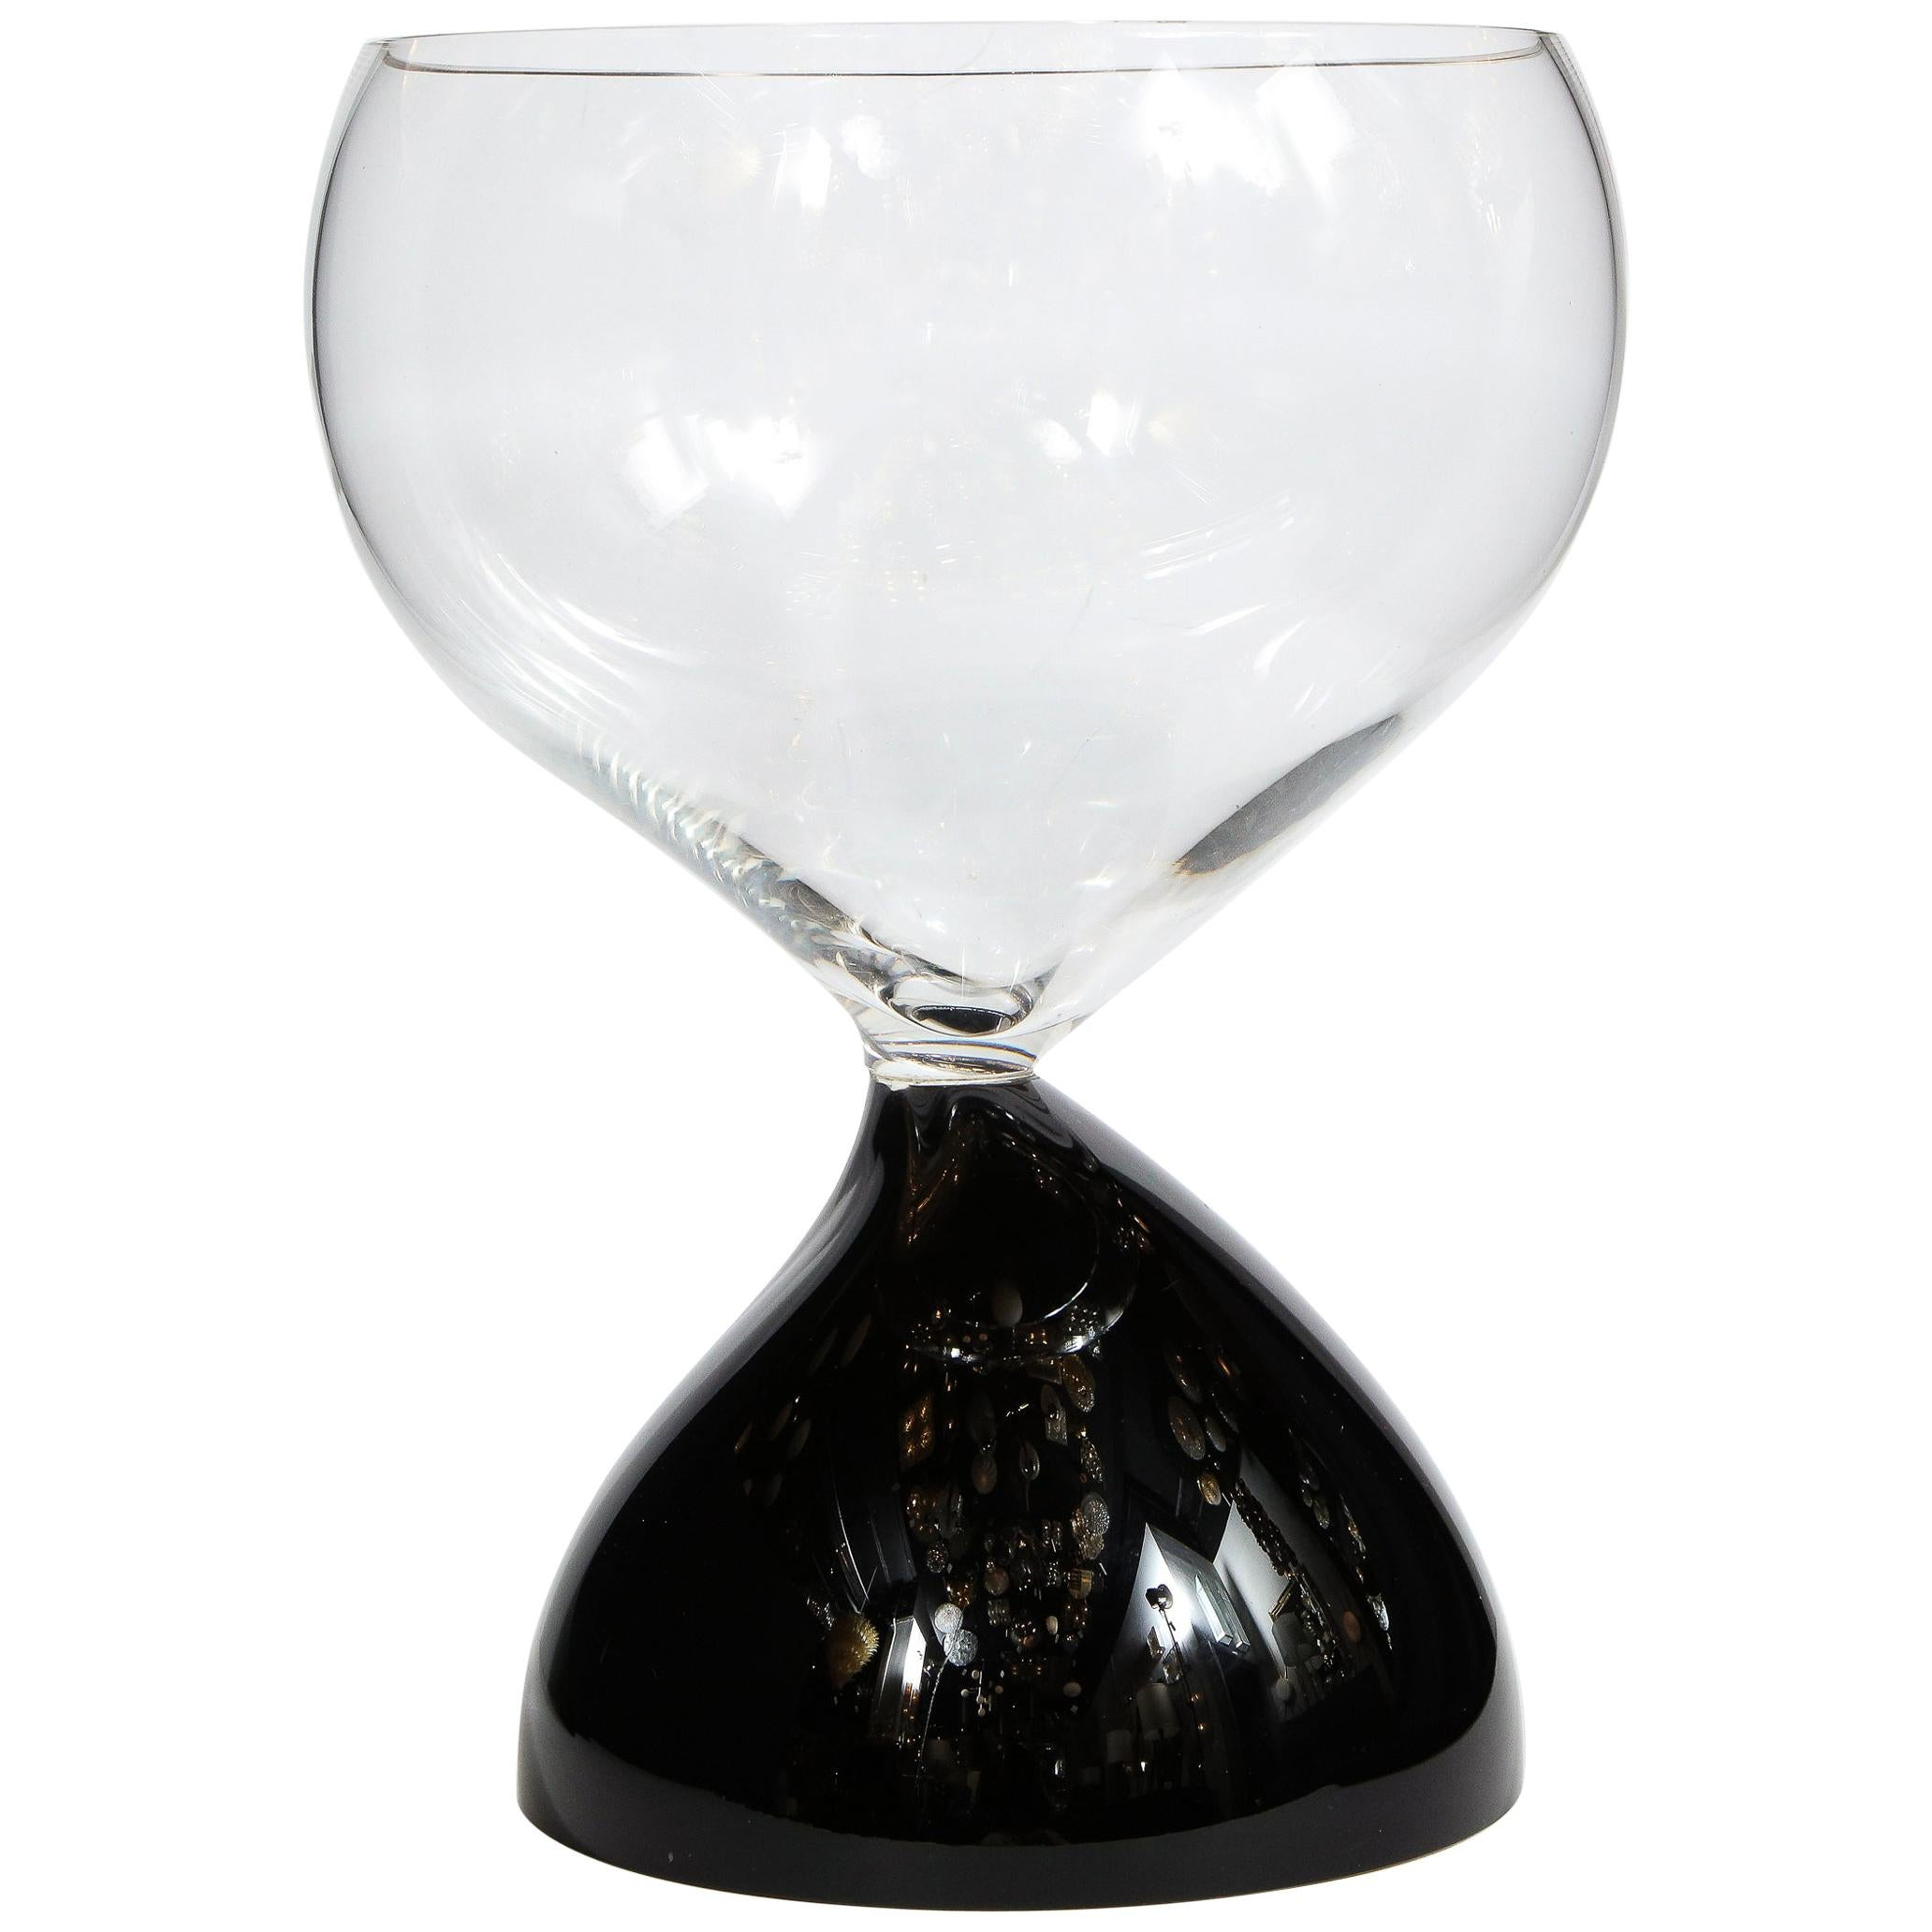 Midcentury Hand Blown Murano Hourglass Center Bowl Signed Cenedese e Albarelli